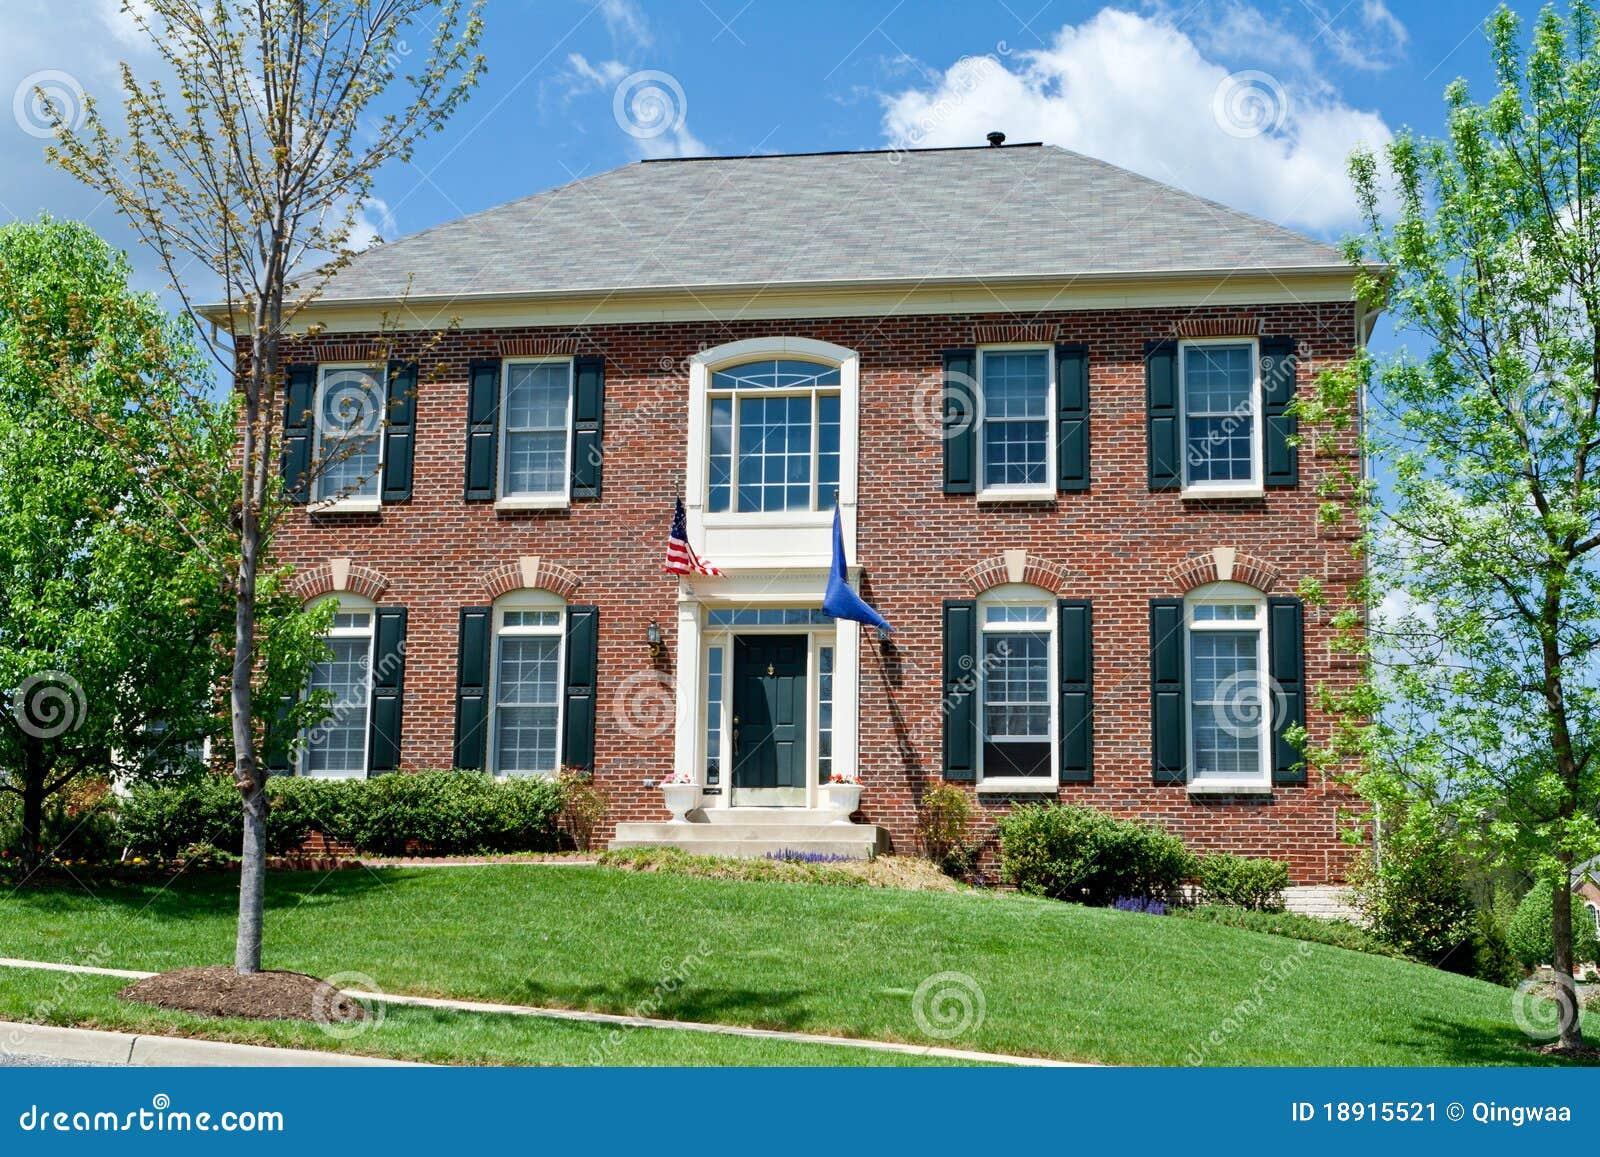 Brick Single Family House Home Suburban Md Usa Stock Image